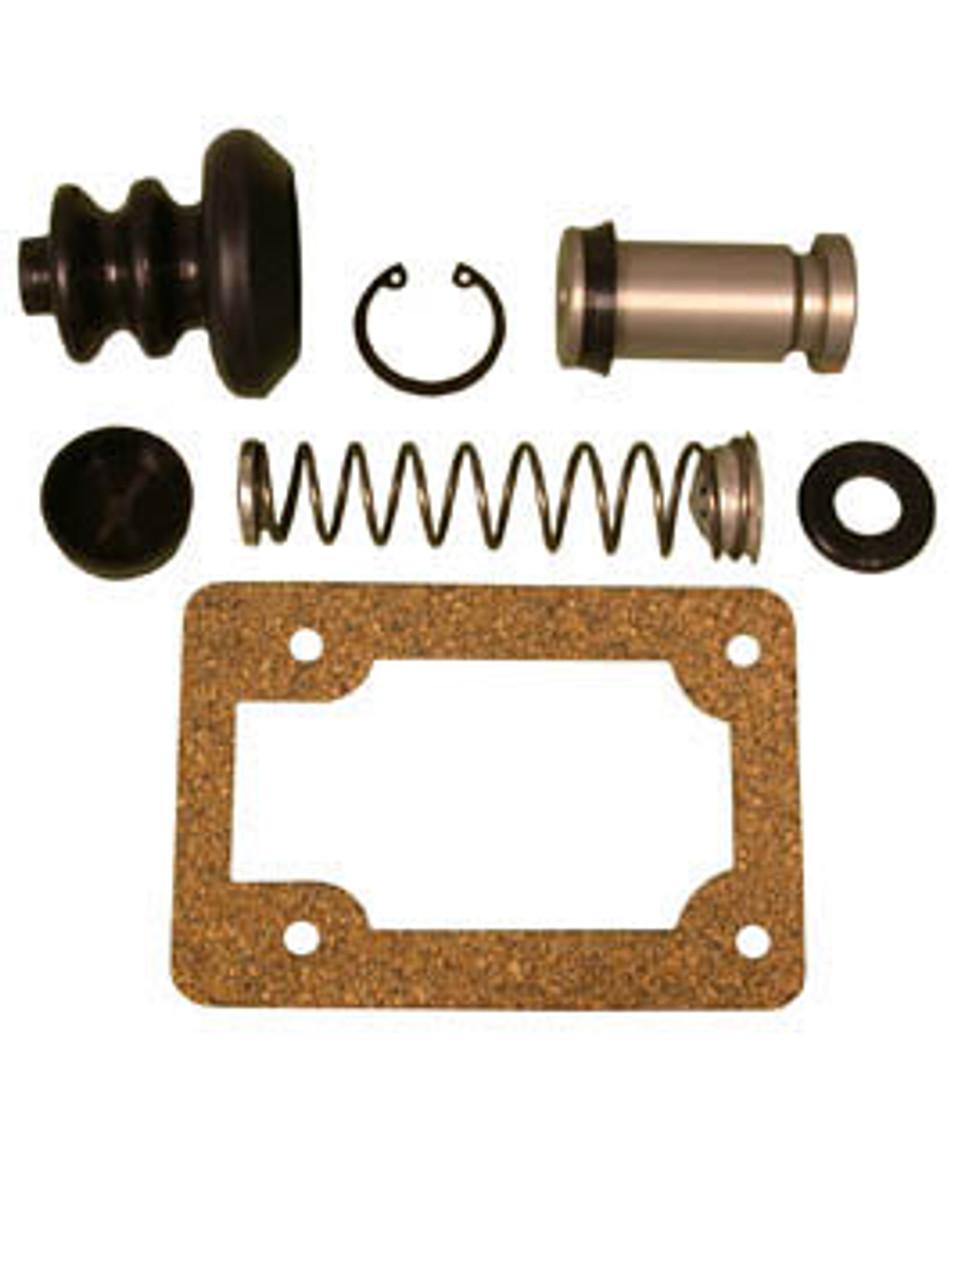 5398 --- Demco Master Cylinder Repair Kit - Drum brakes